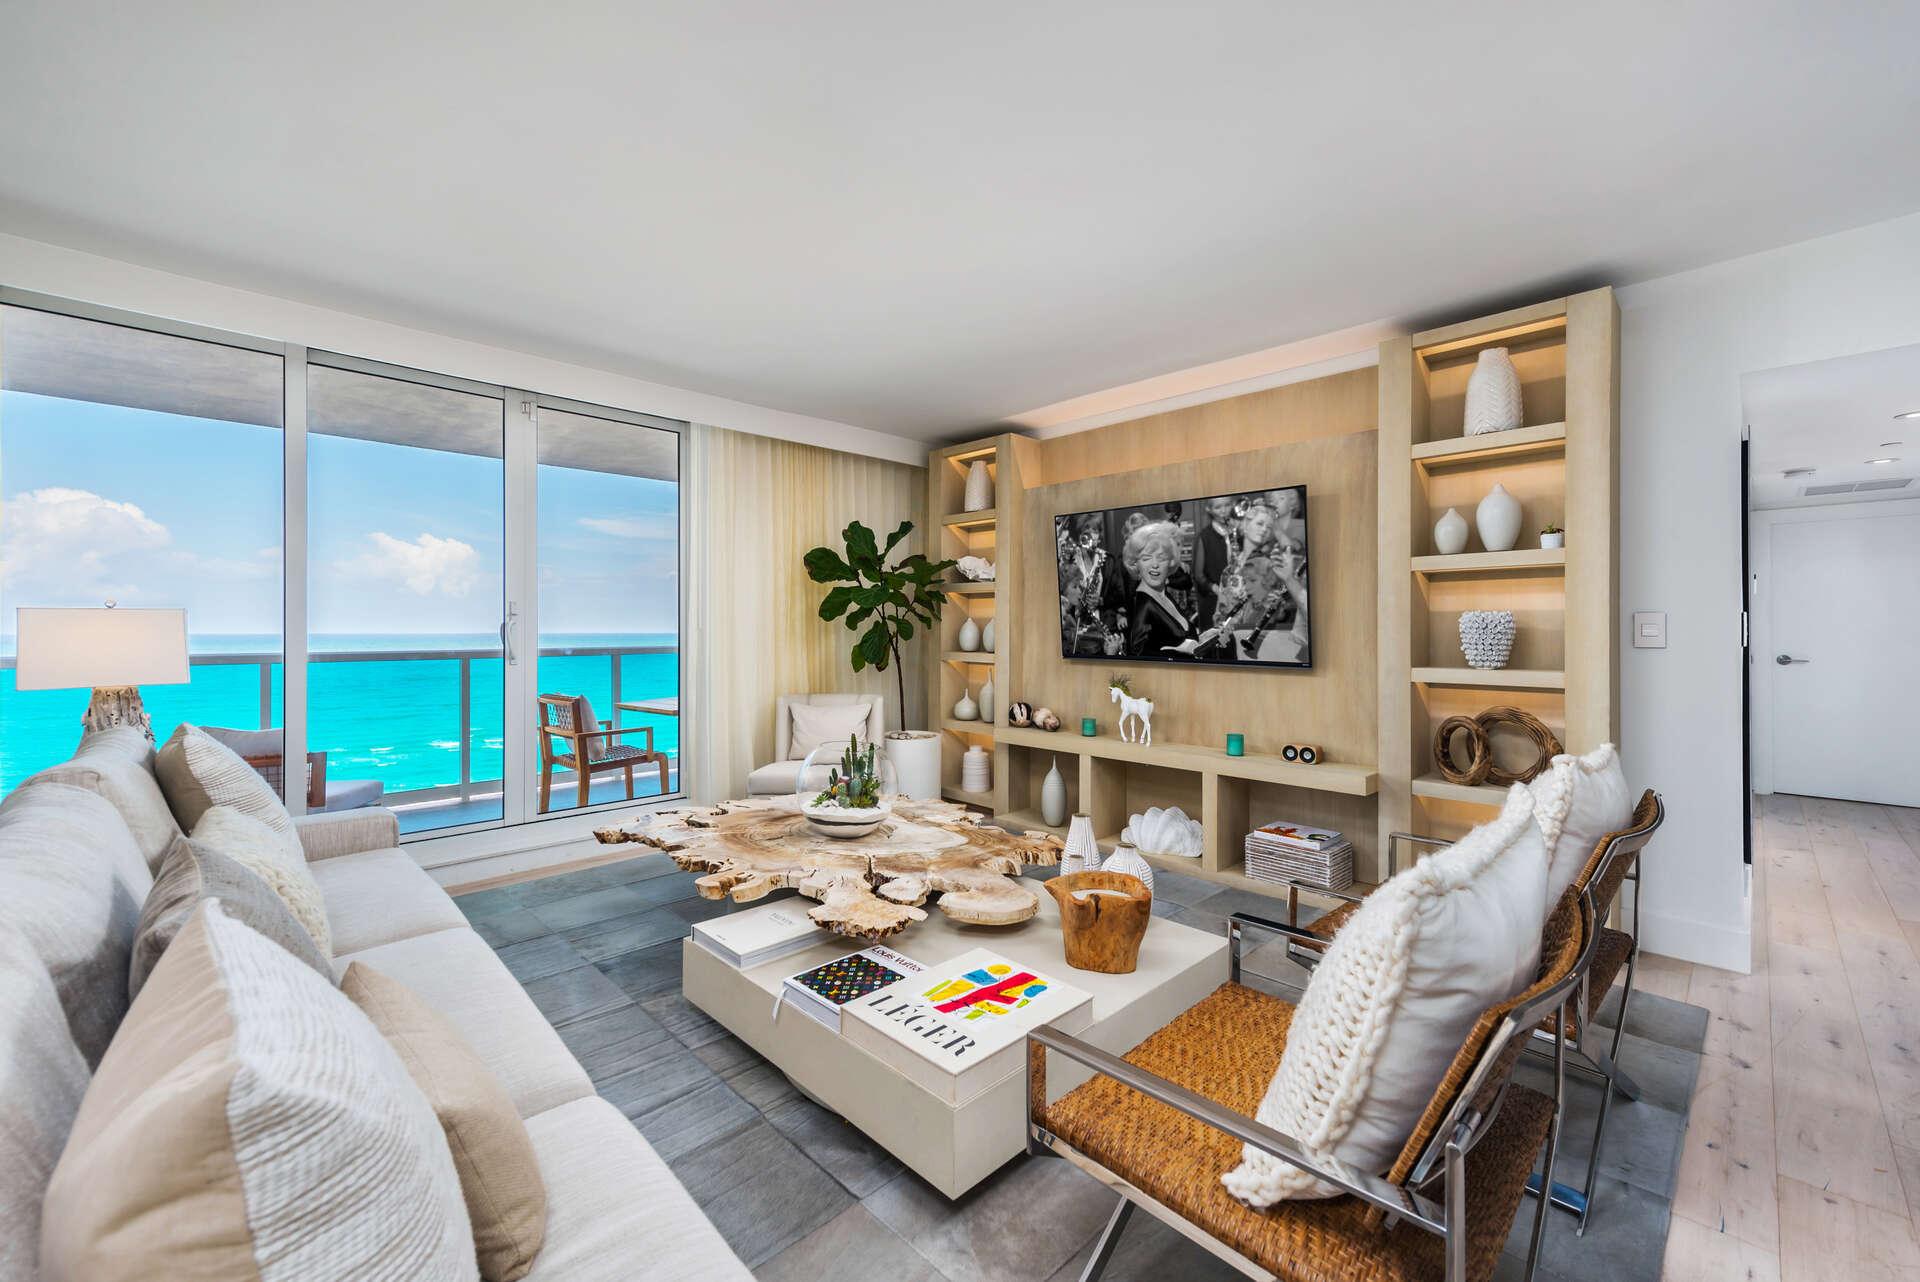 Luxury vacation rentals usa - Florida - Miami beach - Eco hotel southbeach - #1440 | 3 BDM Oceanfront - Image 1/31